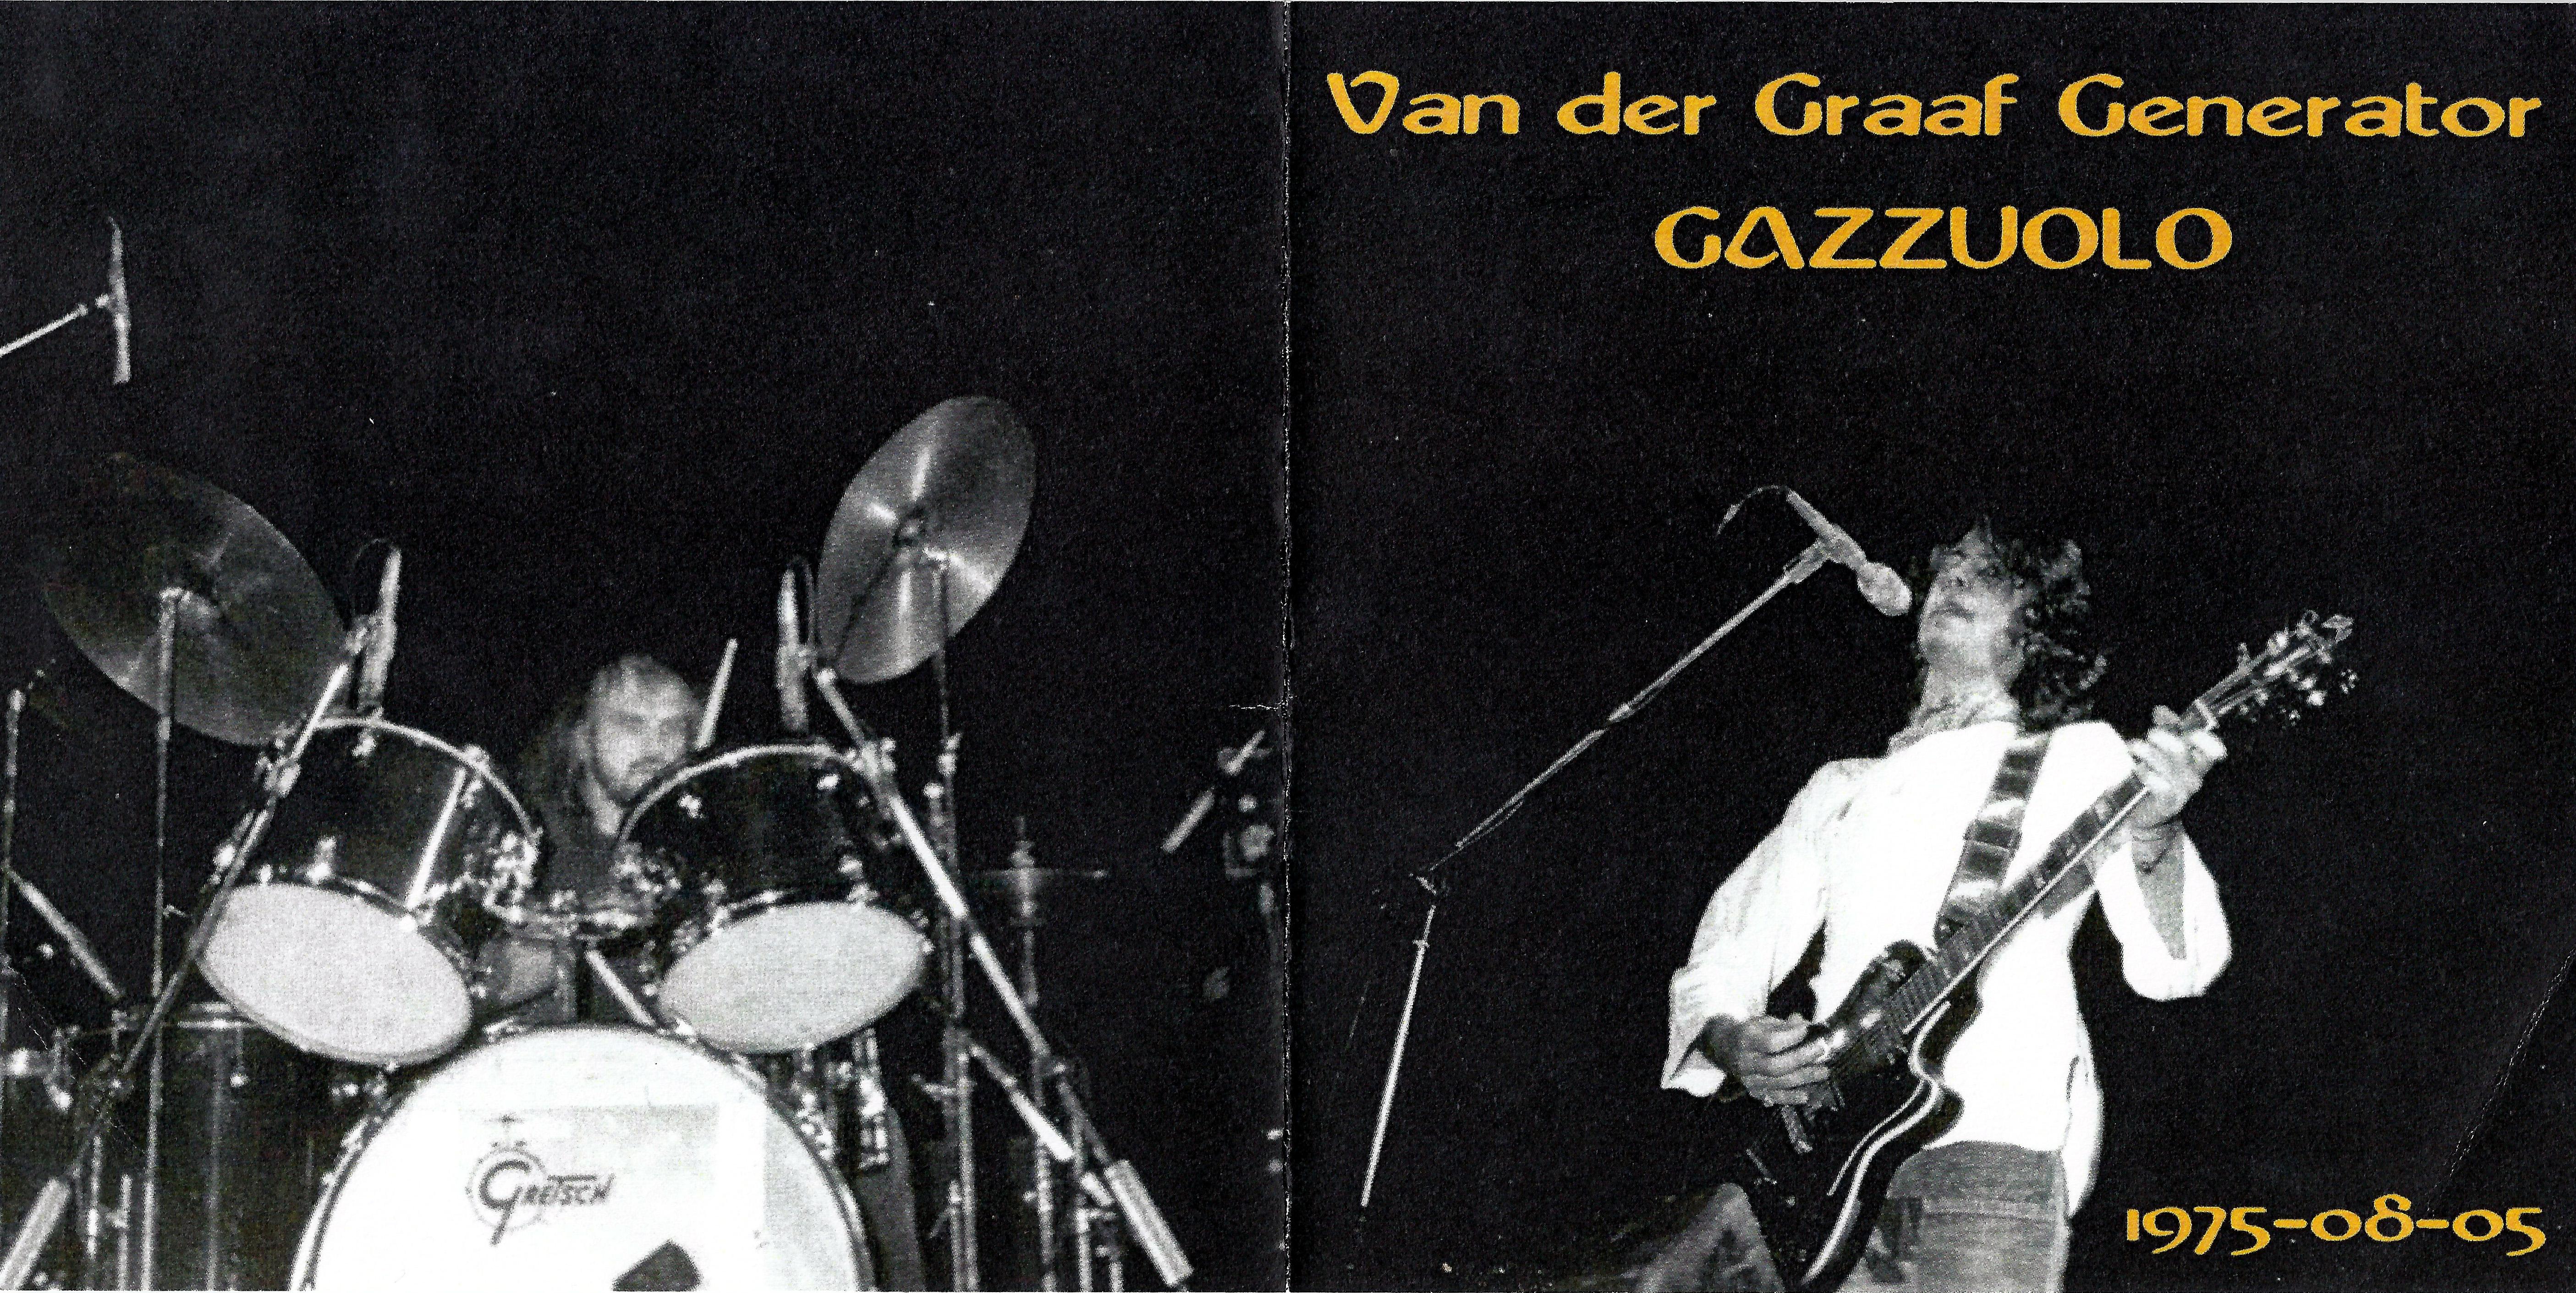 VanDerGraafGenerator1975-08-05CountryArenaGazzuoloItaly1.jpg